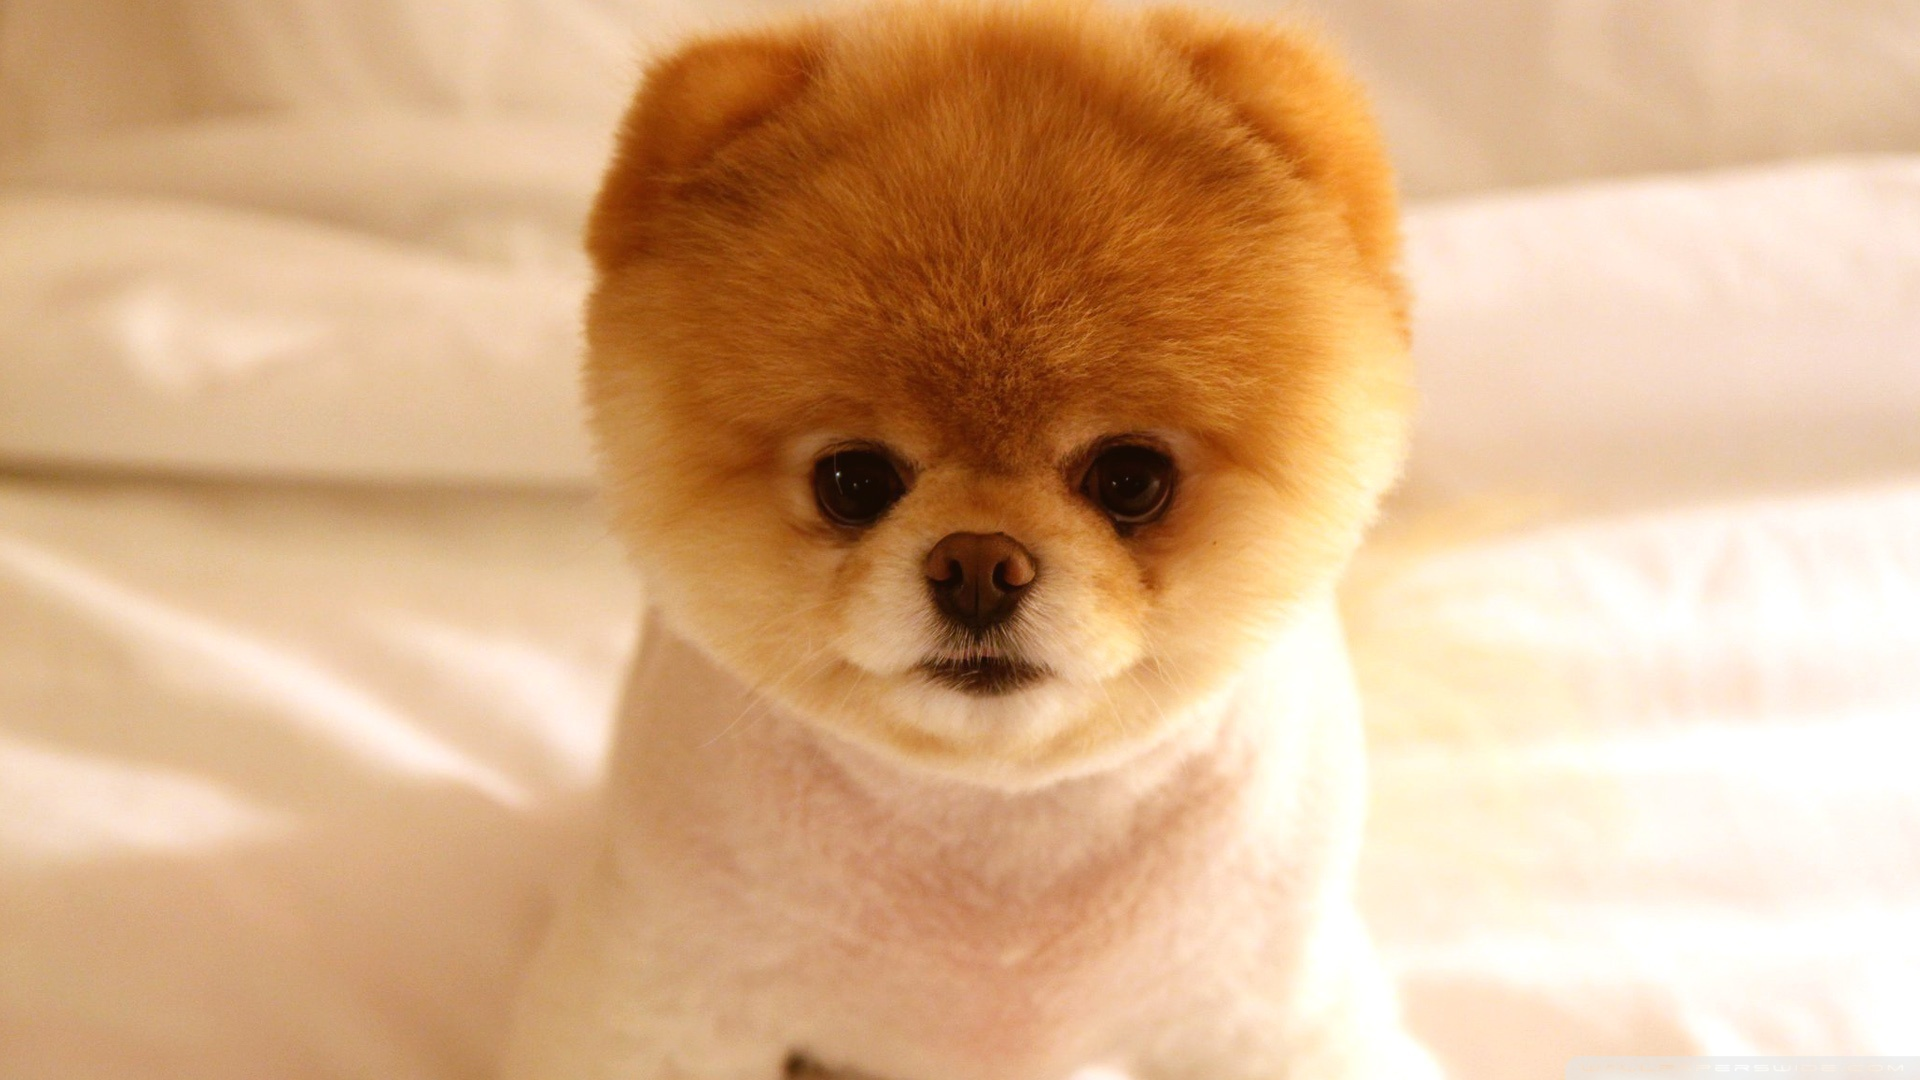 Simple Boo Army Adorable Dog - cute_dog_boo-wallpaper-1920x1080  HD_74465  .jpg